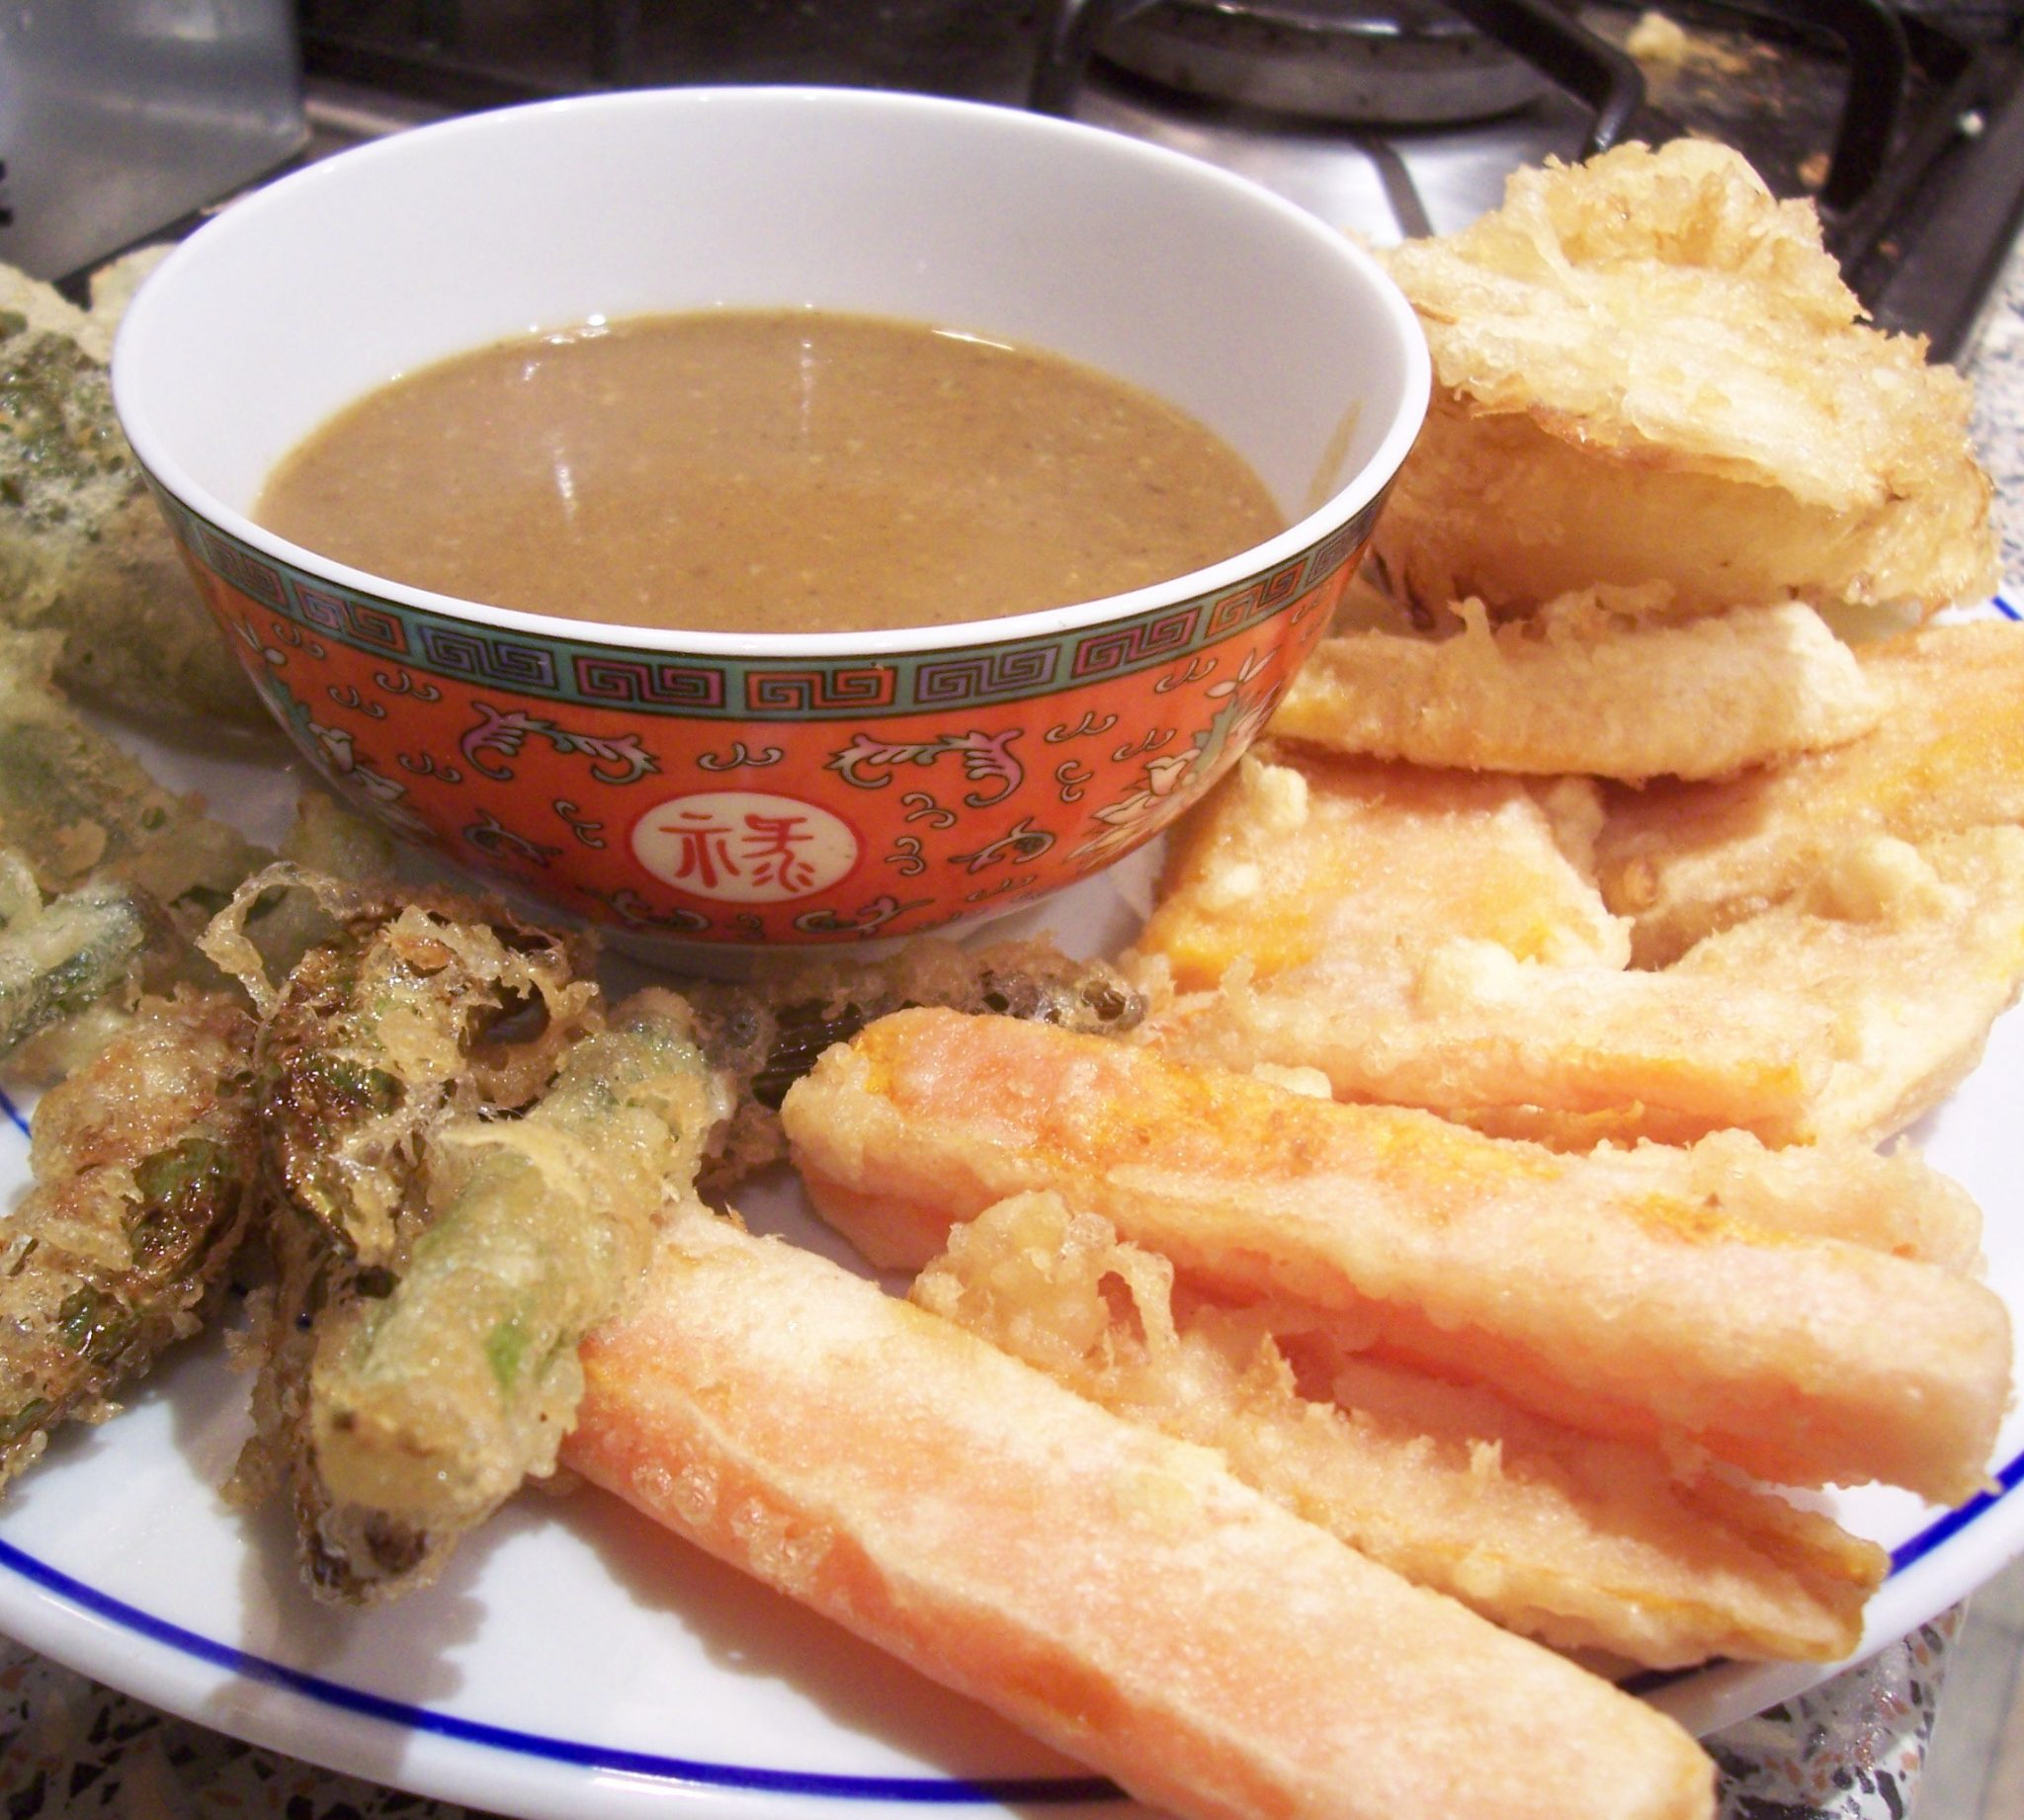 Mixed vegetable tempura recipe